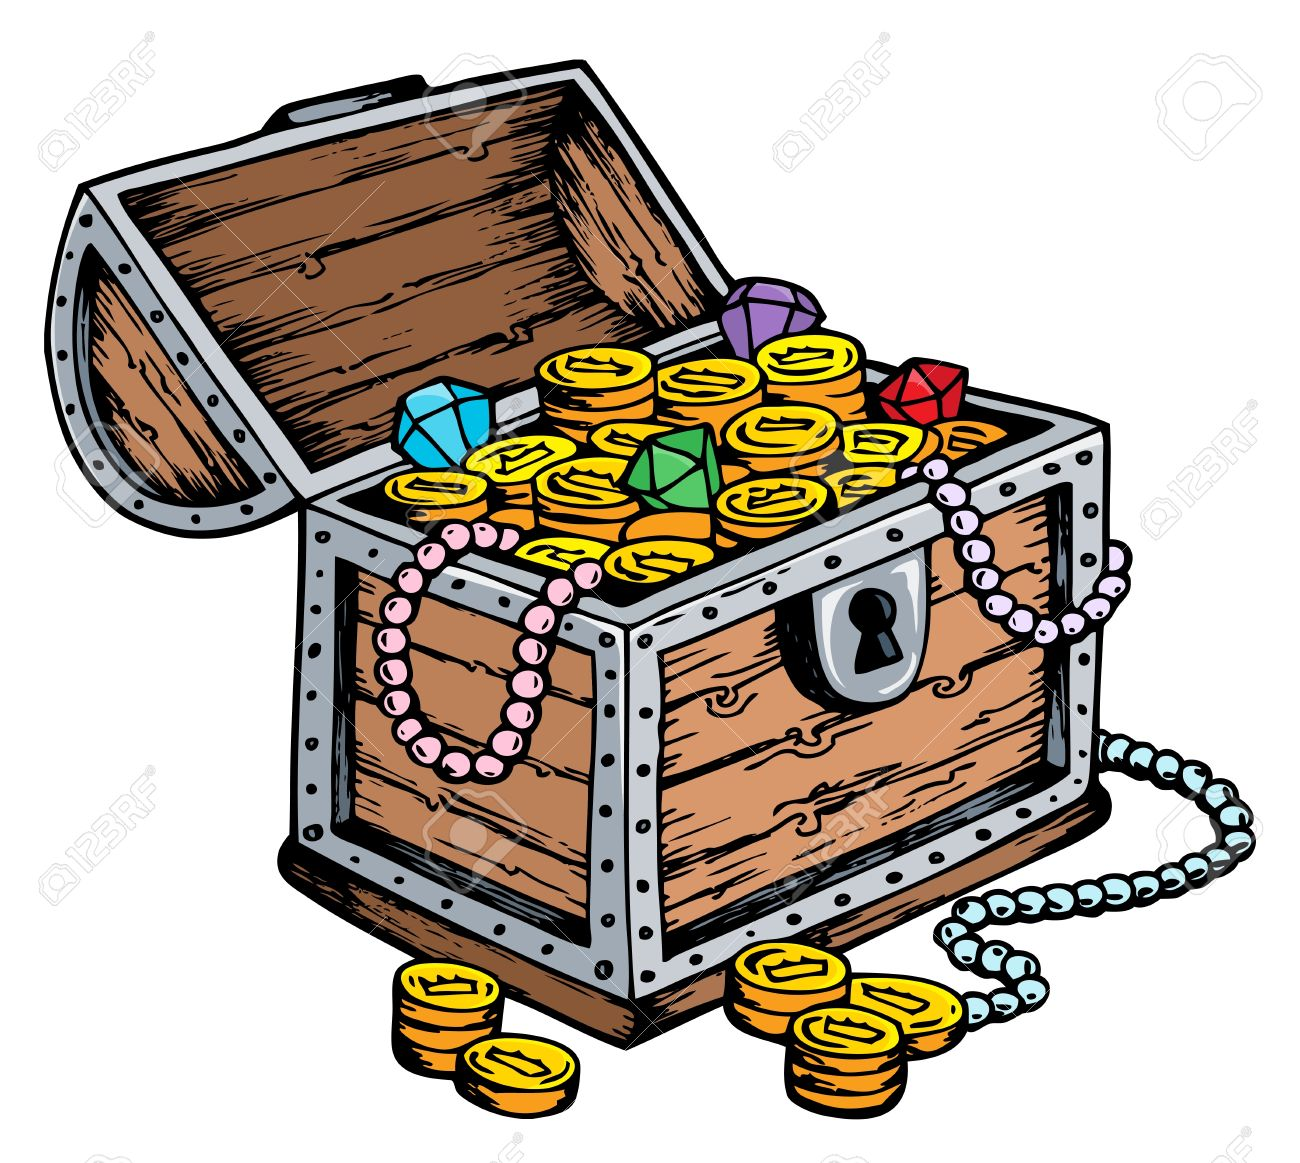 Treasure Box Drawing at GetDrawings.com.